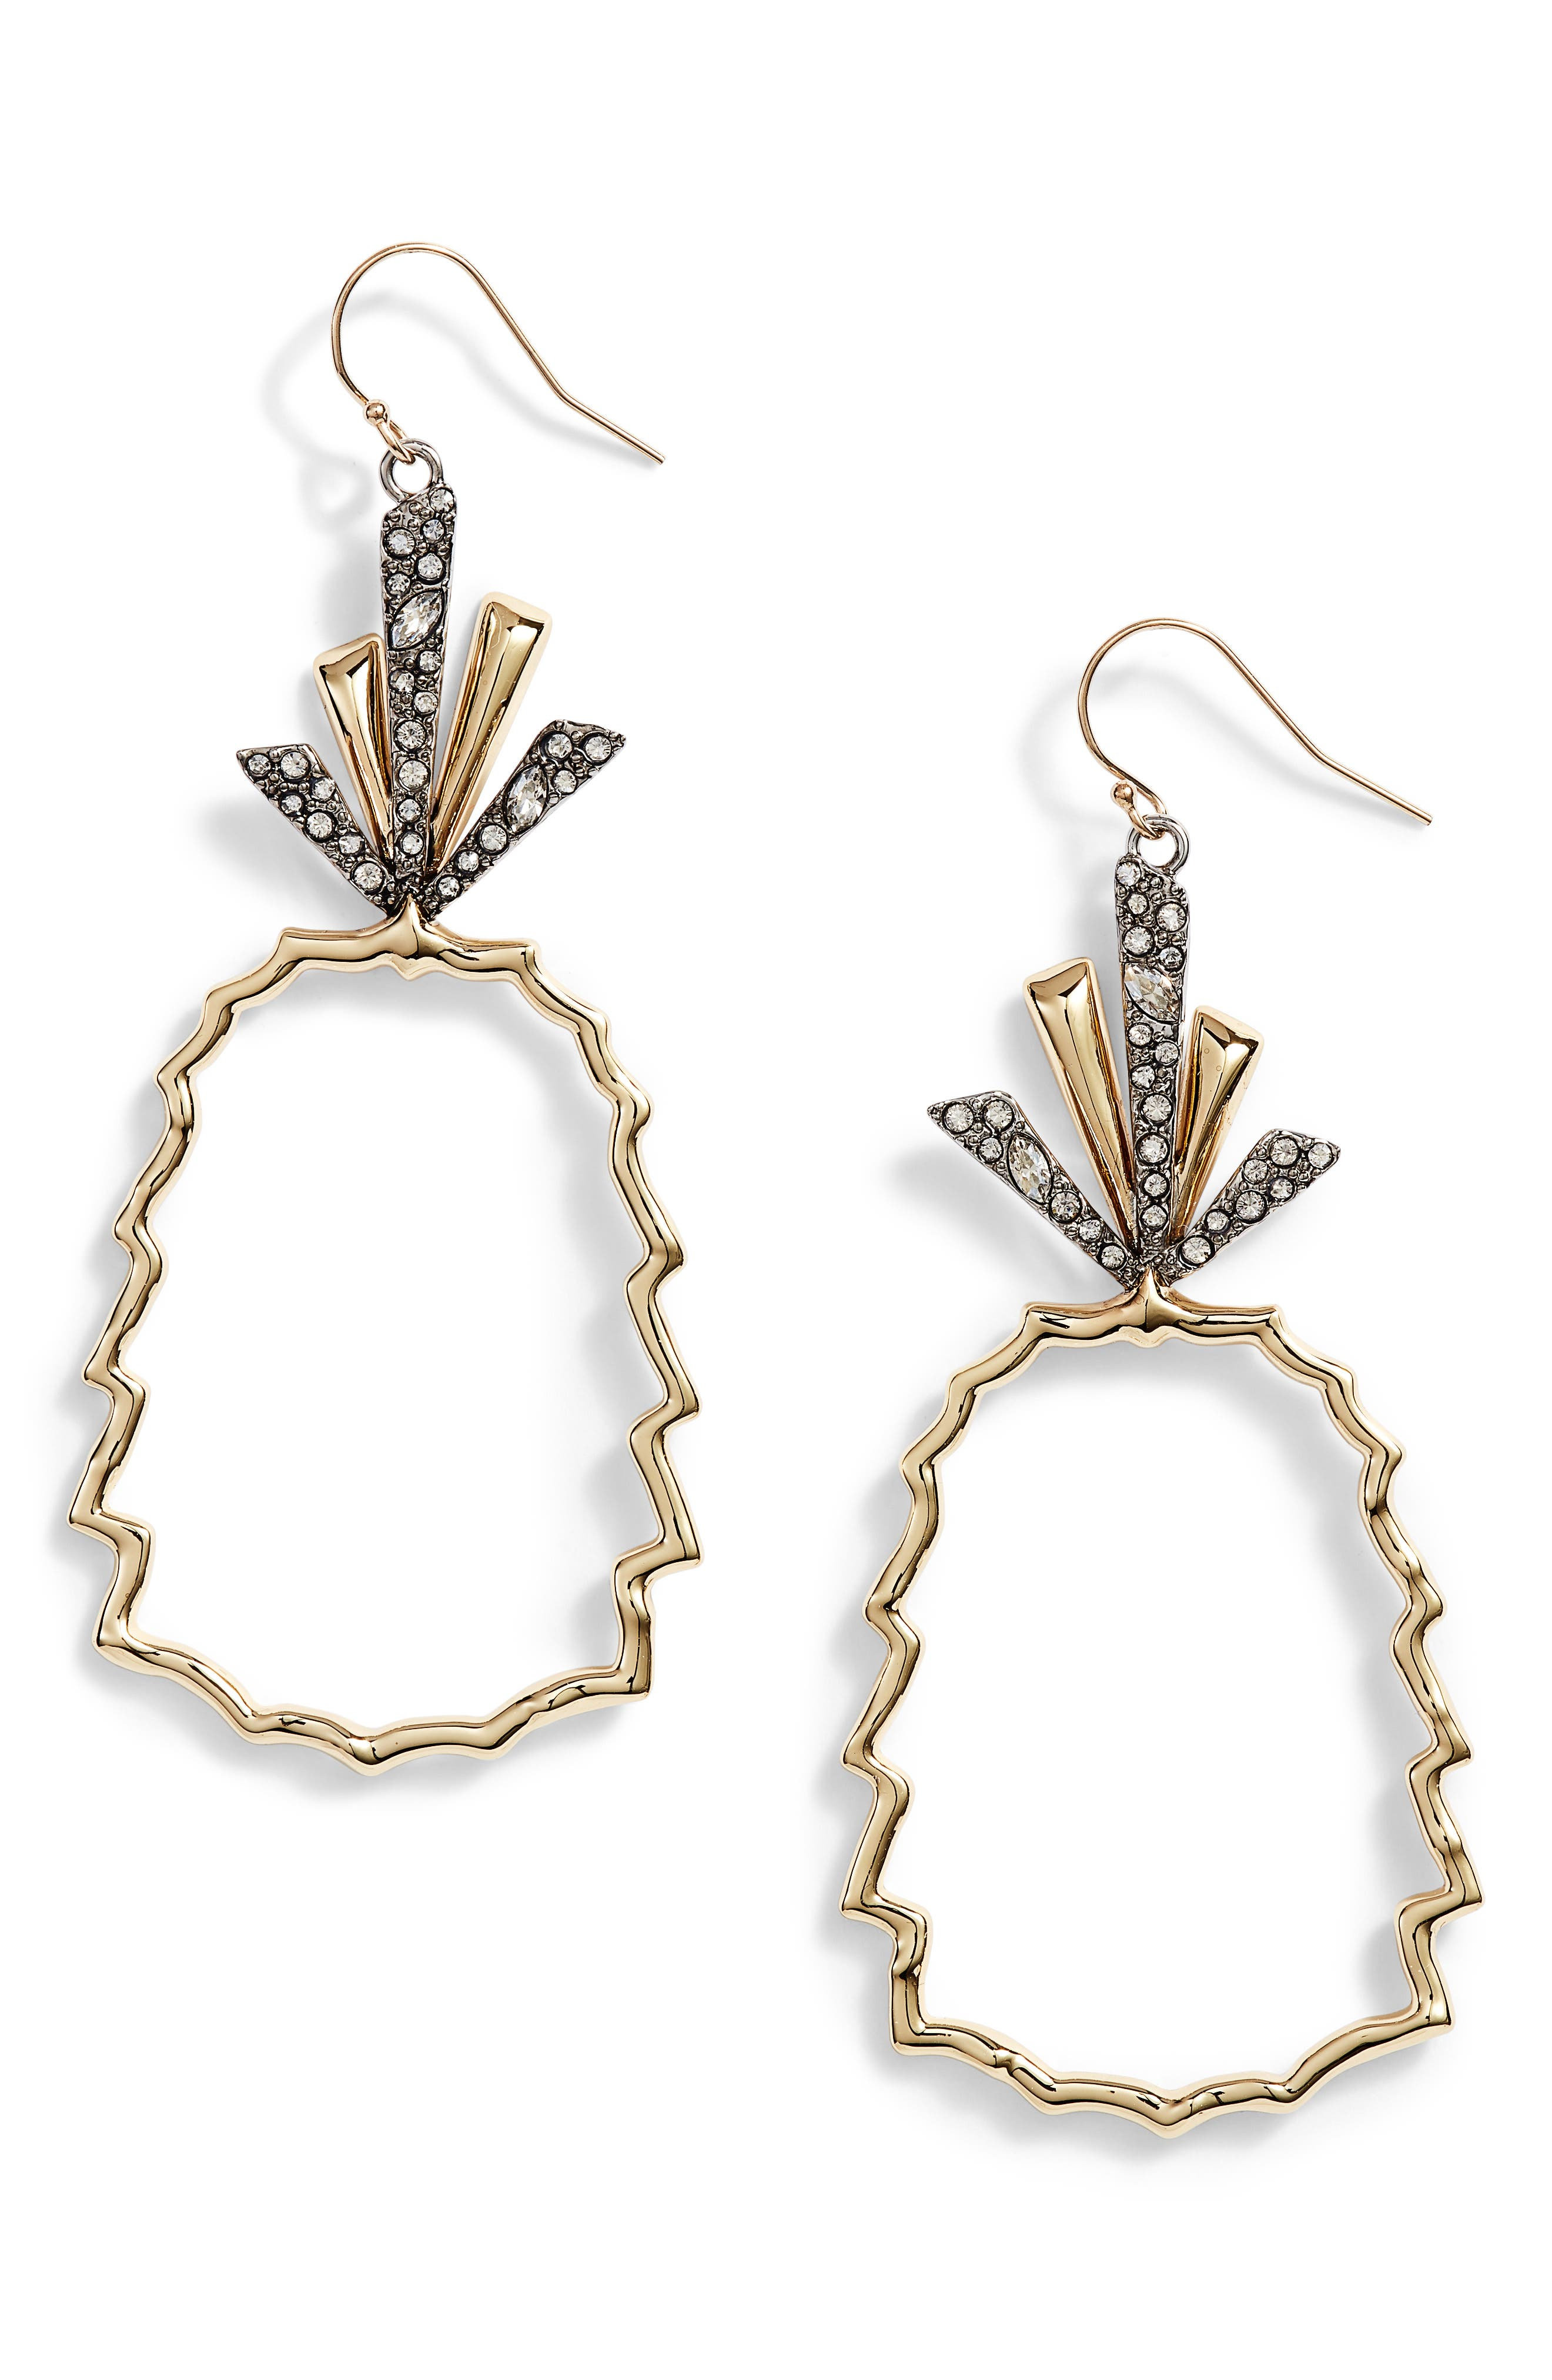 Main Image - Alexis Bittar Crystal Leaf Pineapple Earrings